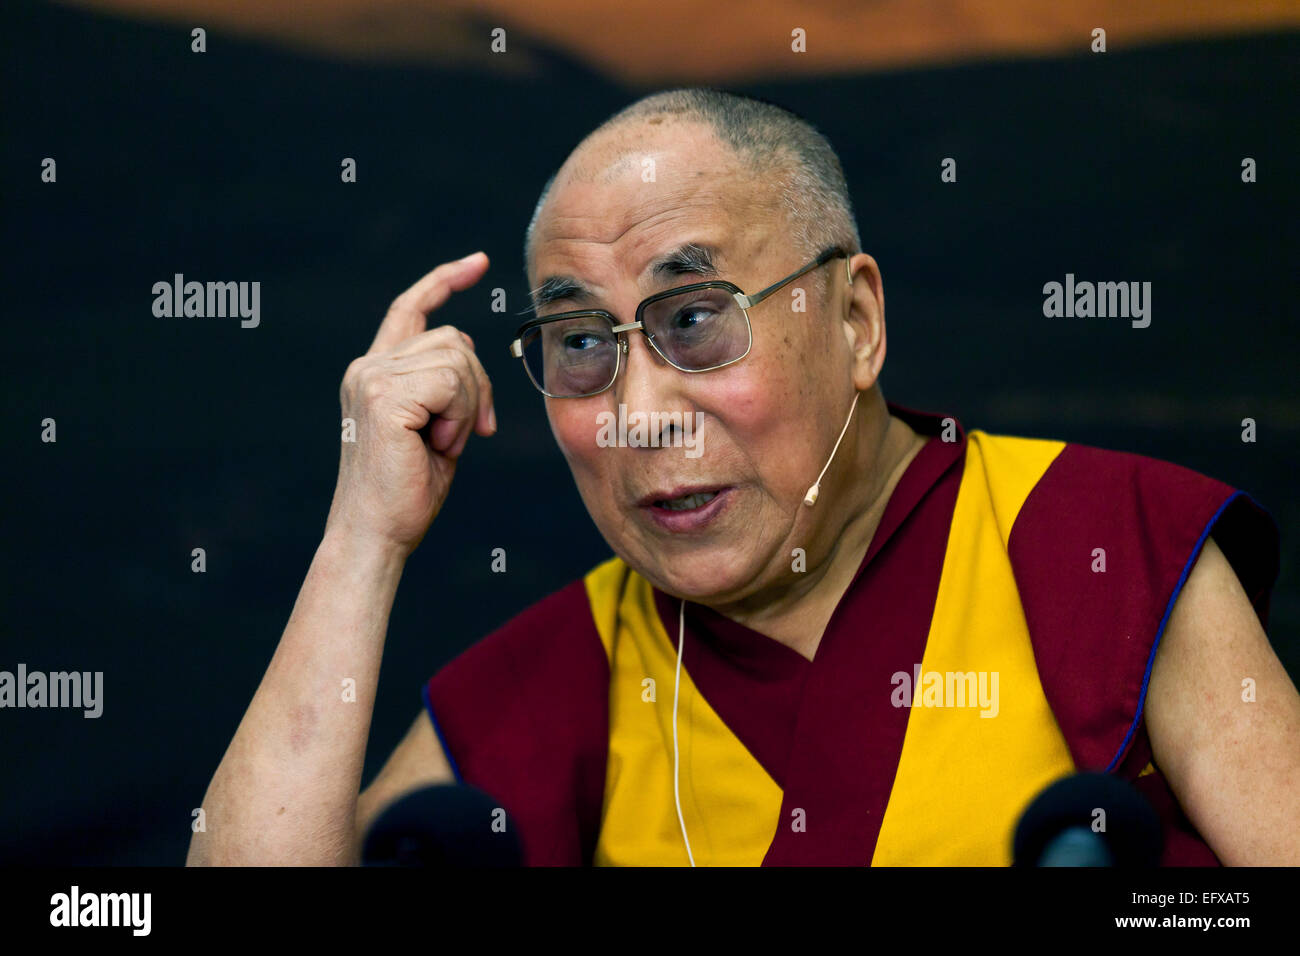 Copenhagen, Denmark. 11th February, 2015. Dalai Lama talks to the media during his press conference in Copenhagen. Stock Photo